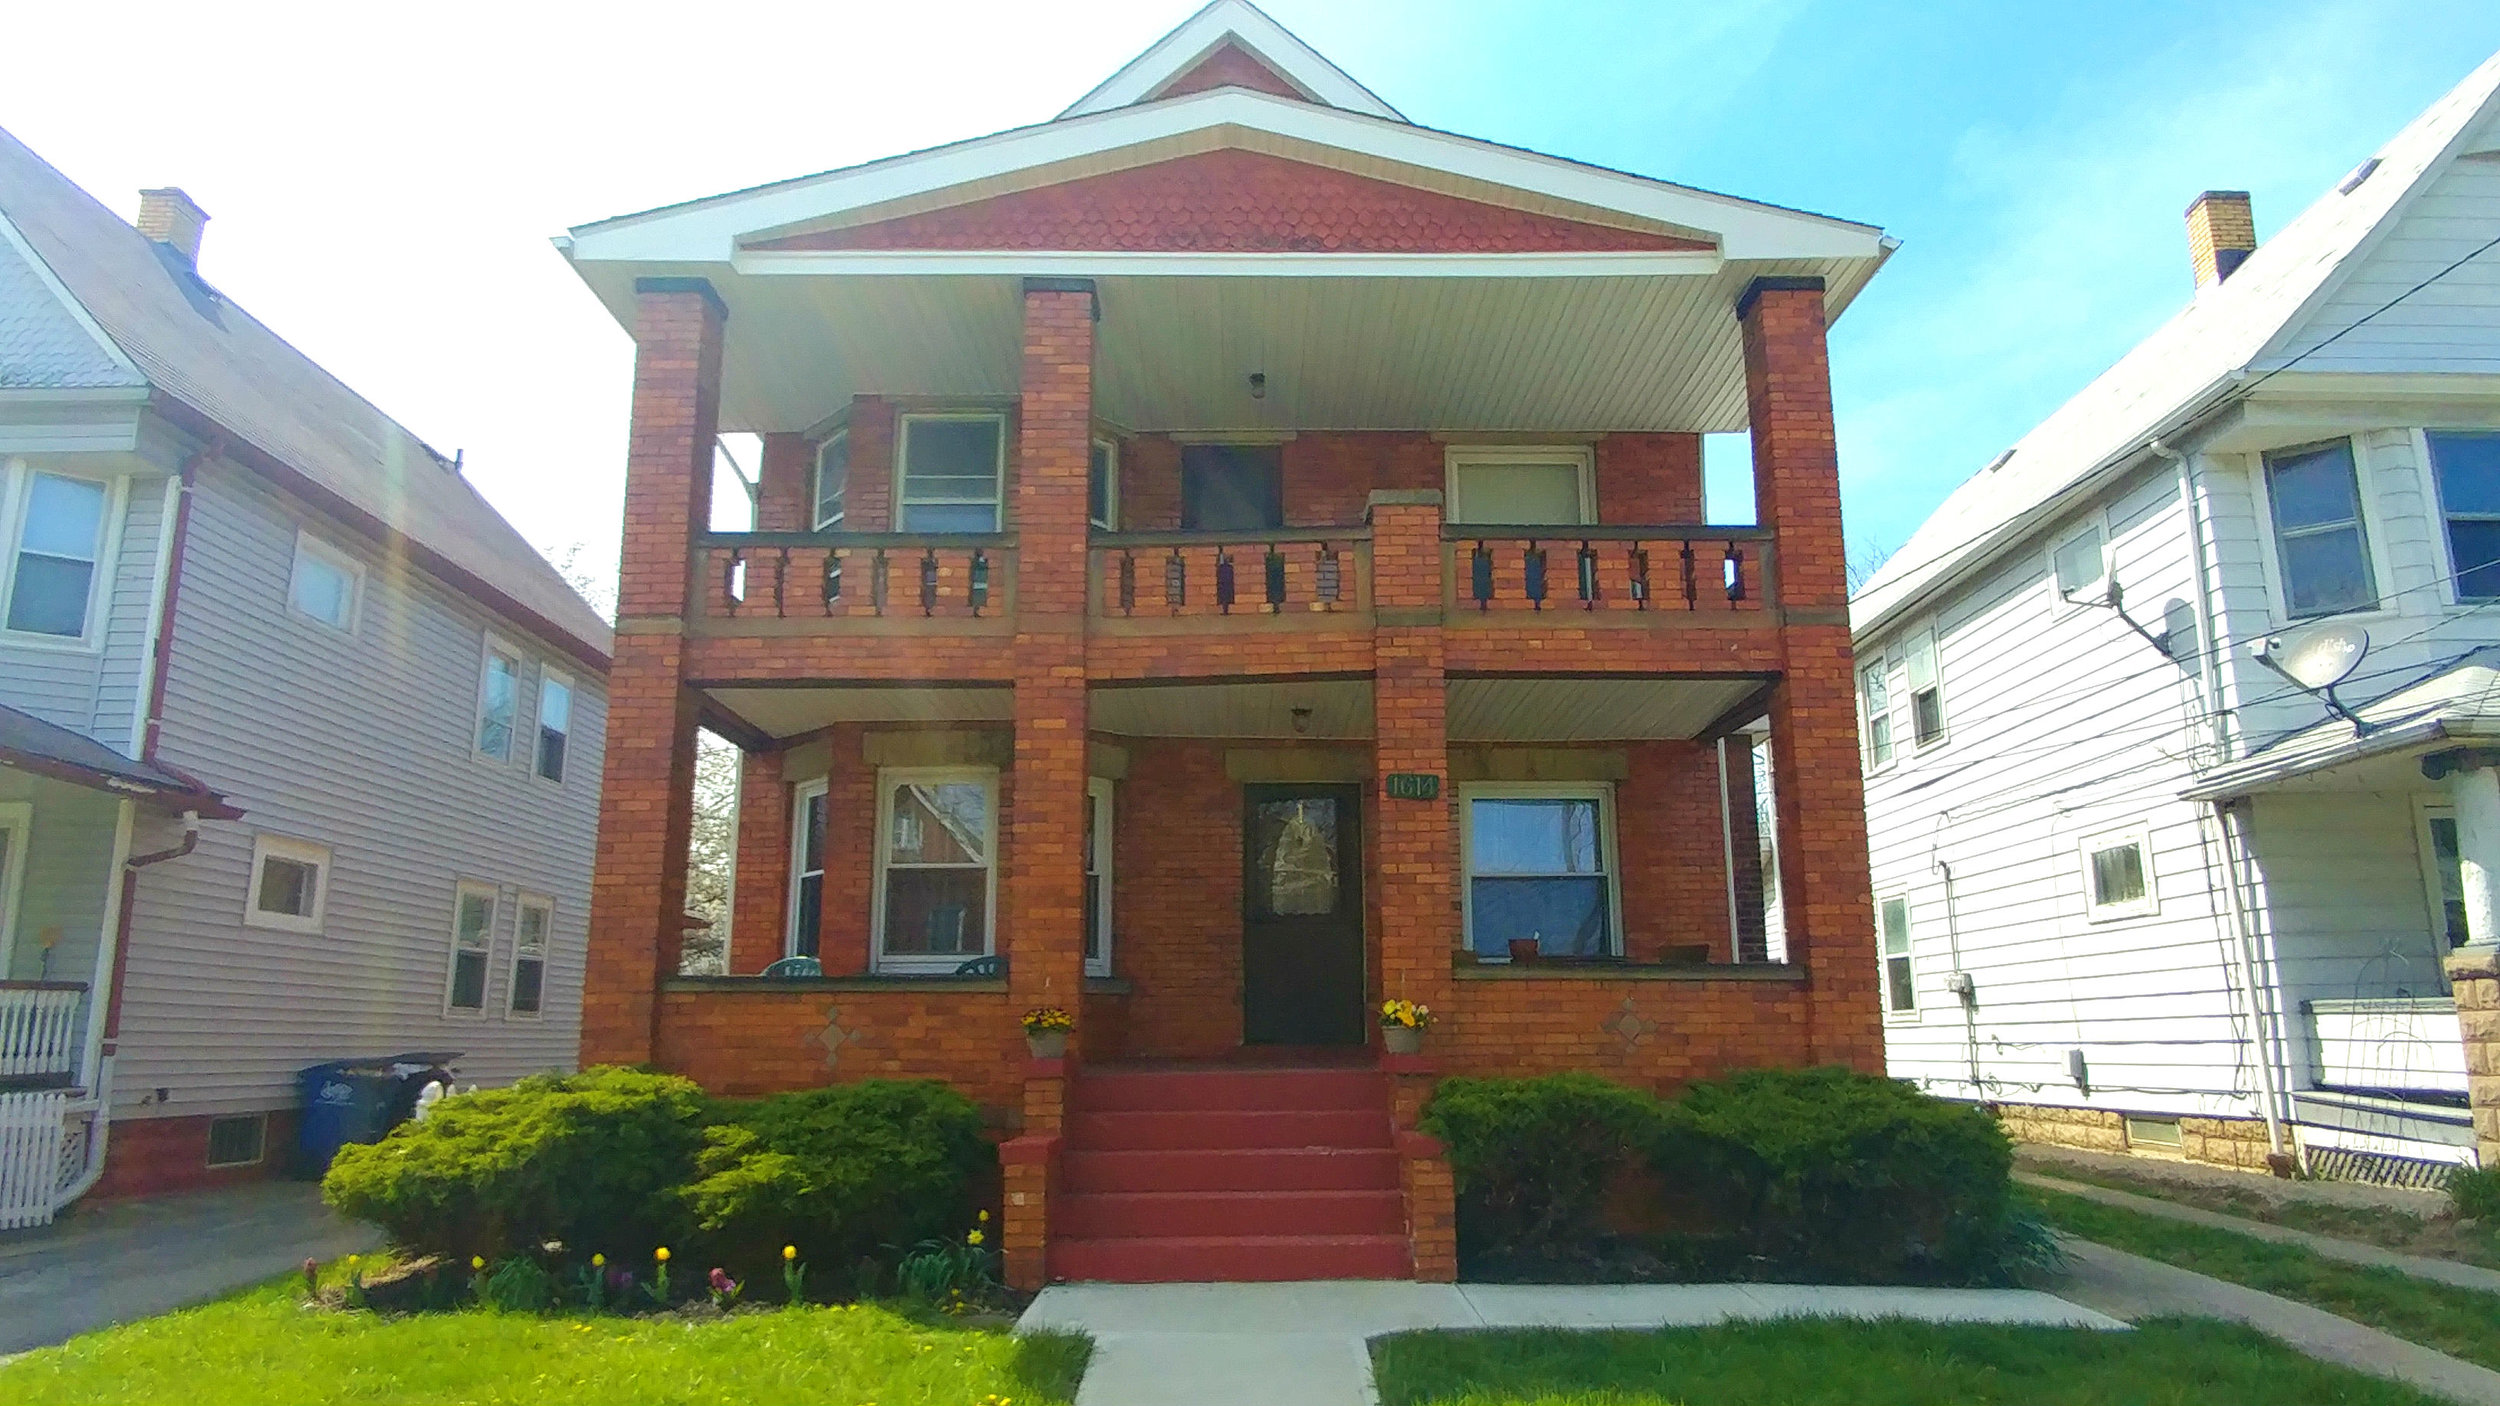 1614 Ridgewood Ave., Lakewood | 4 bed 2 bath | 2,056 Sq. Ft. | $110,00